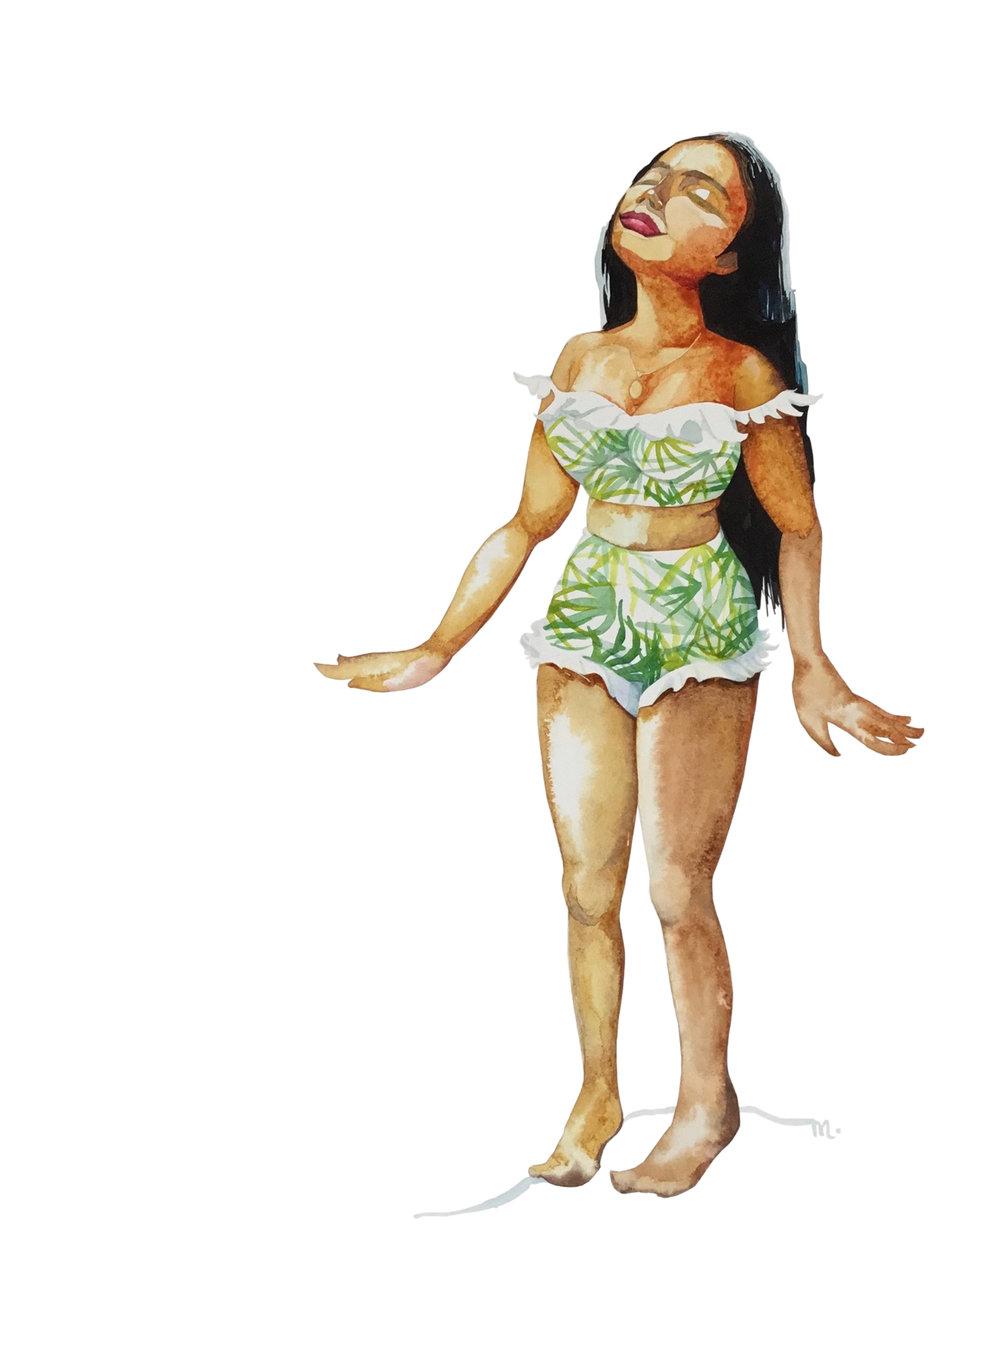 Marisol Imelda:  Sun Babes 3/20